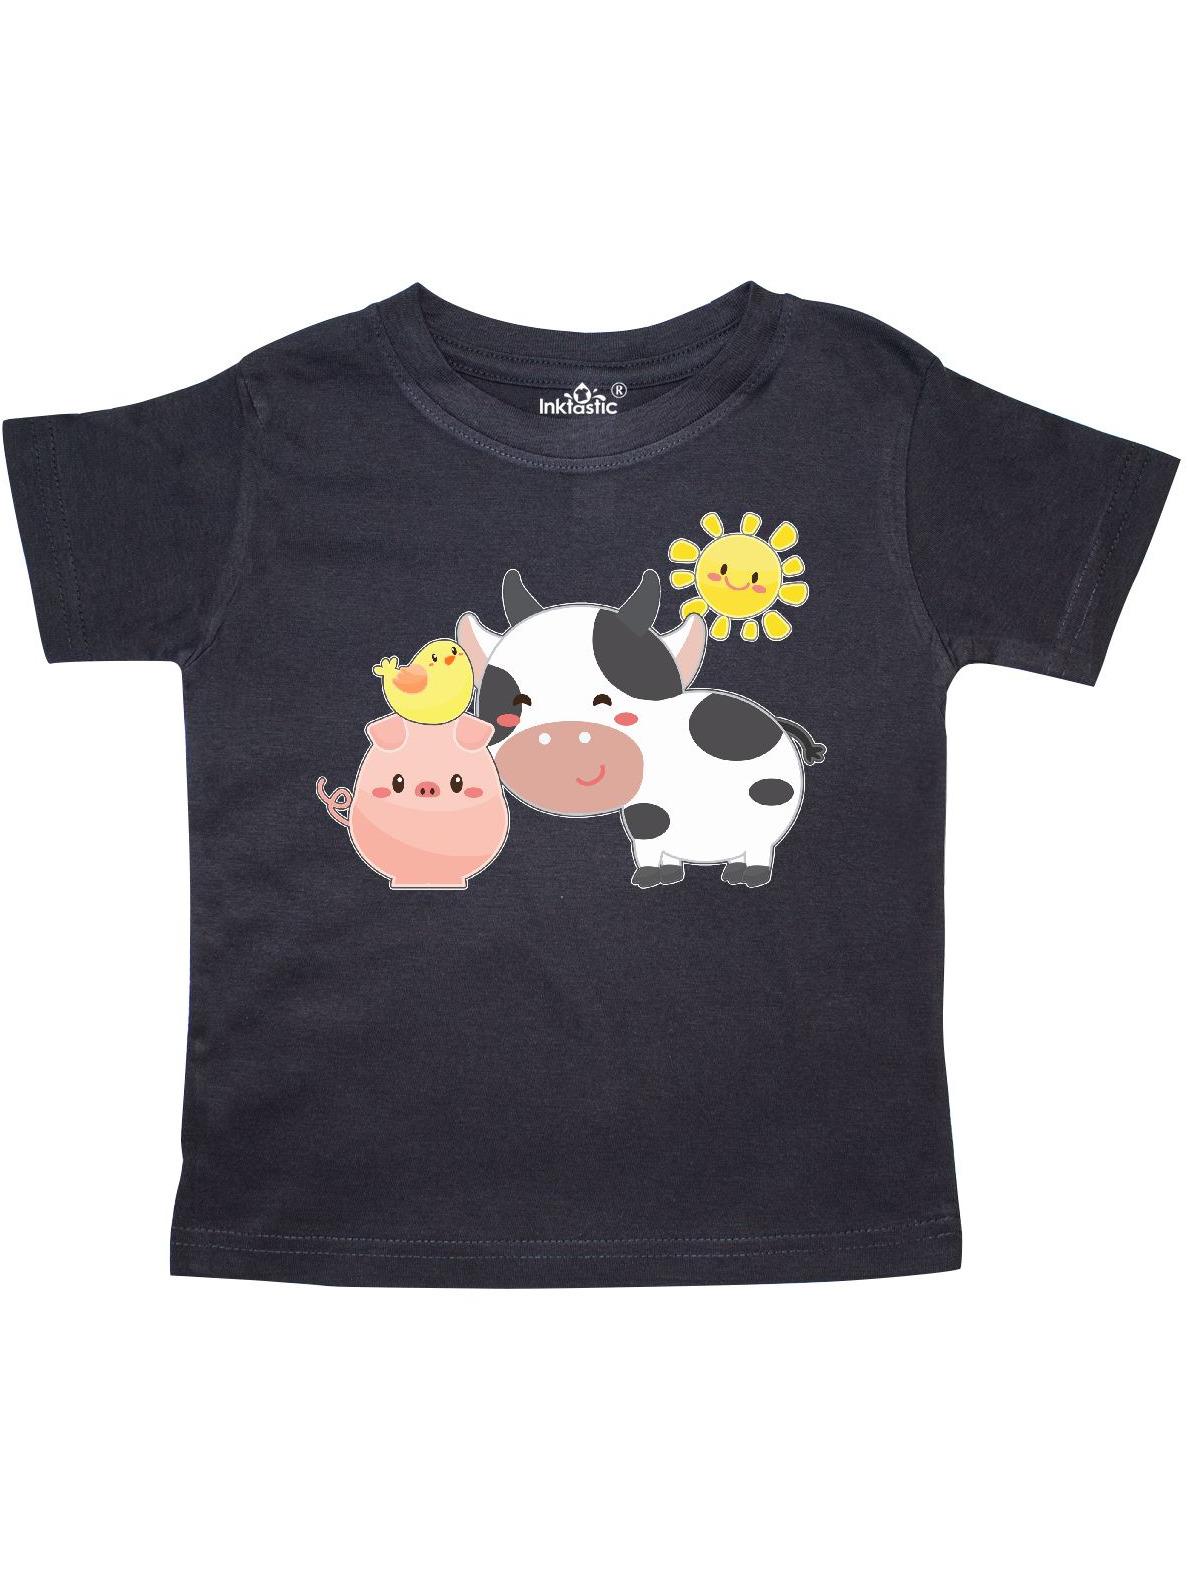 Fun Farm Animals- cow, pig, chick Toddler T-Shirt